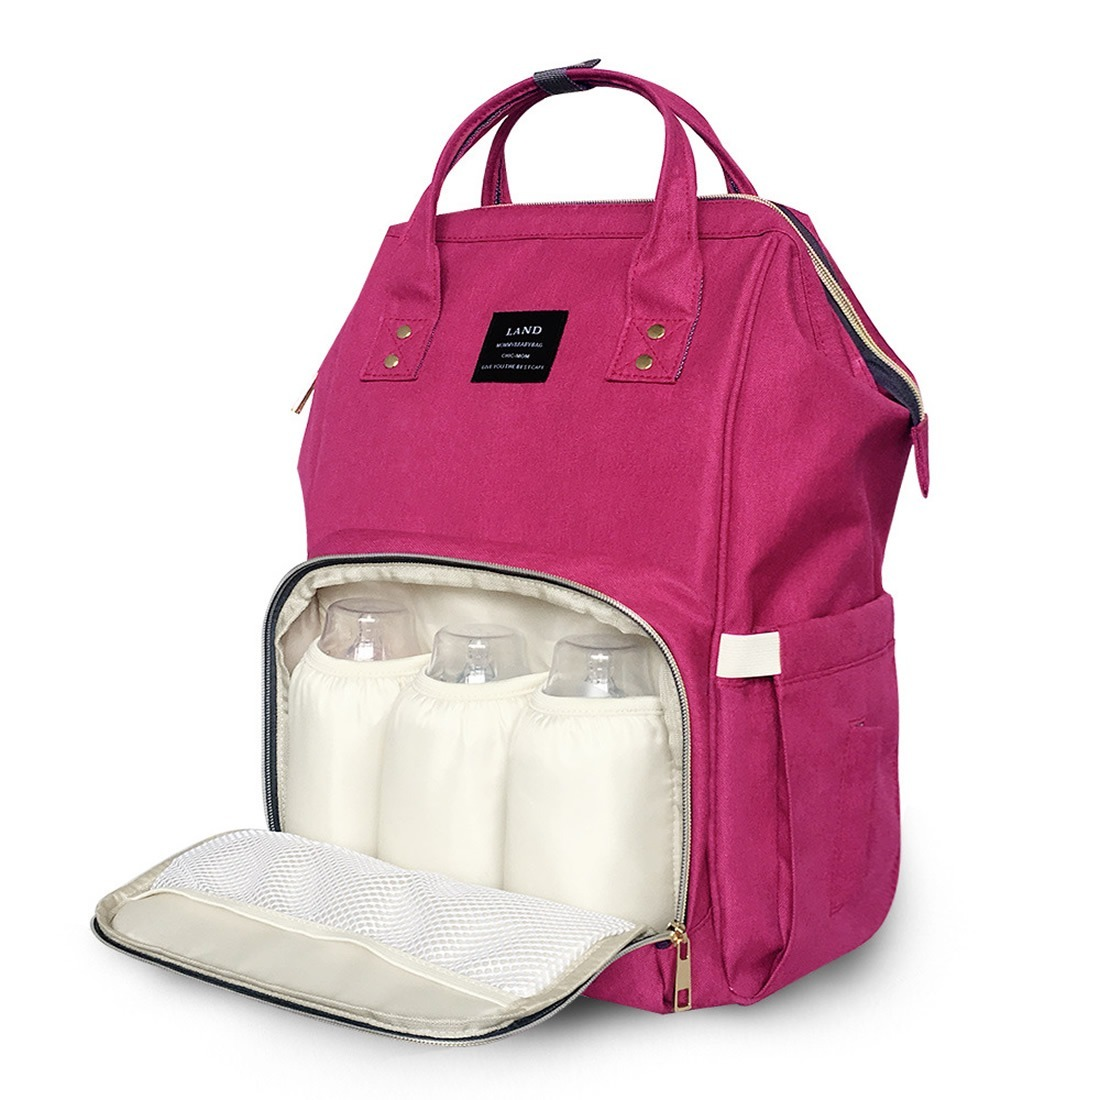 3aebb7a313 Pañaleras mochila bolsas para bebes pañales land mama cargando zoom jpg  1100x1100 Bolsas para bebe